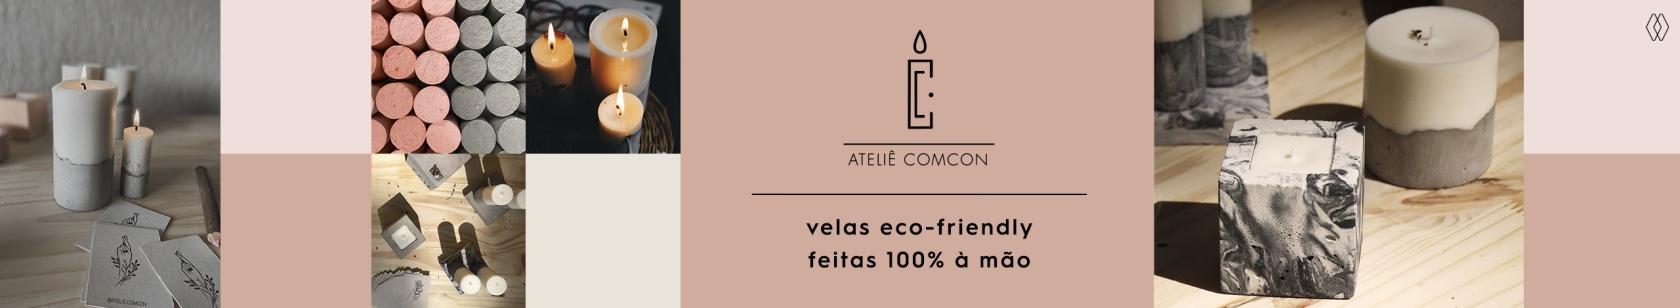 ATELIÊ COMCON | AMARO